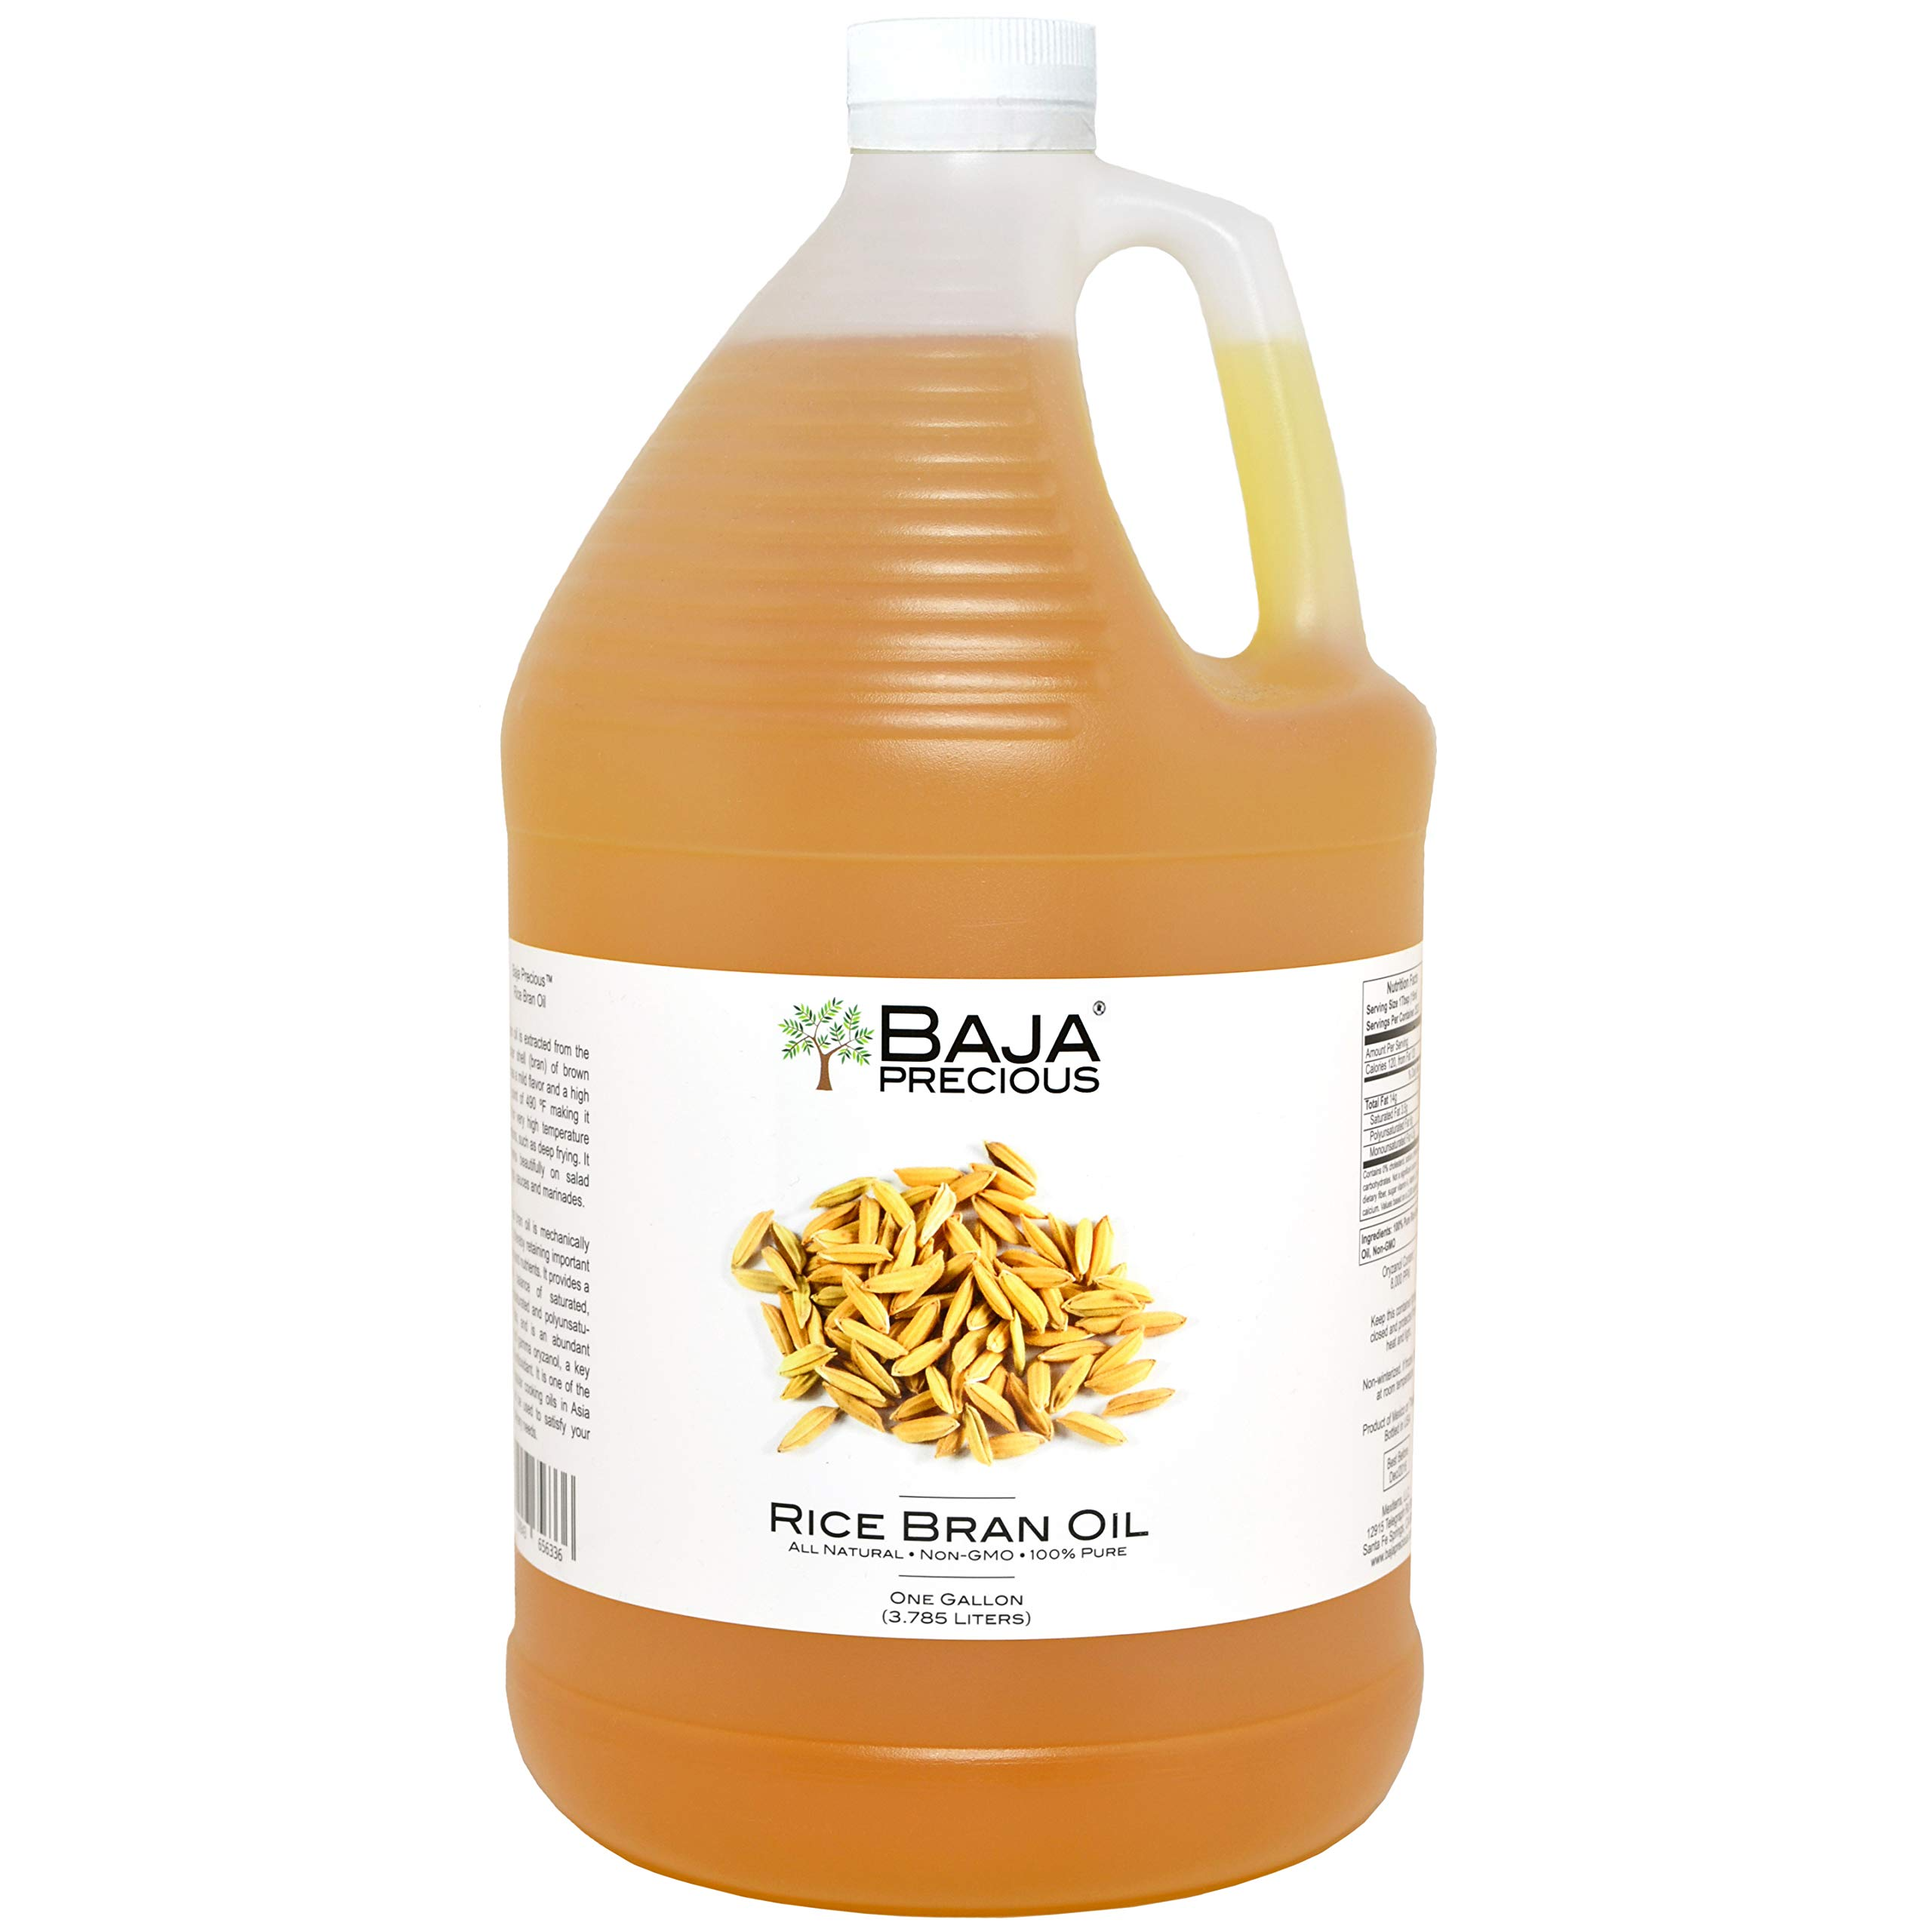 Baja Precious - Rice Bran Oil, 1 Gallon